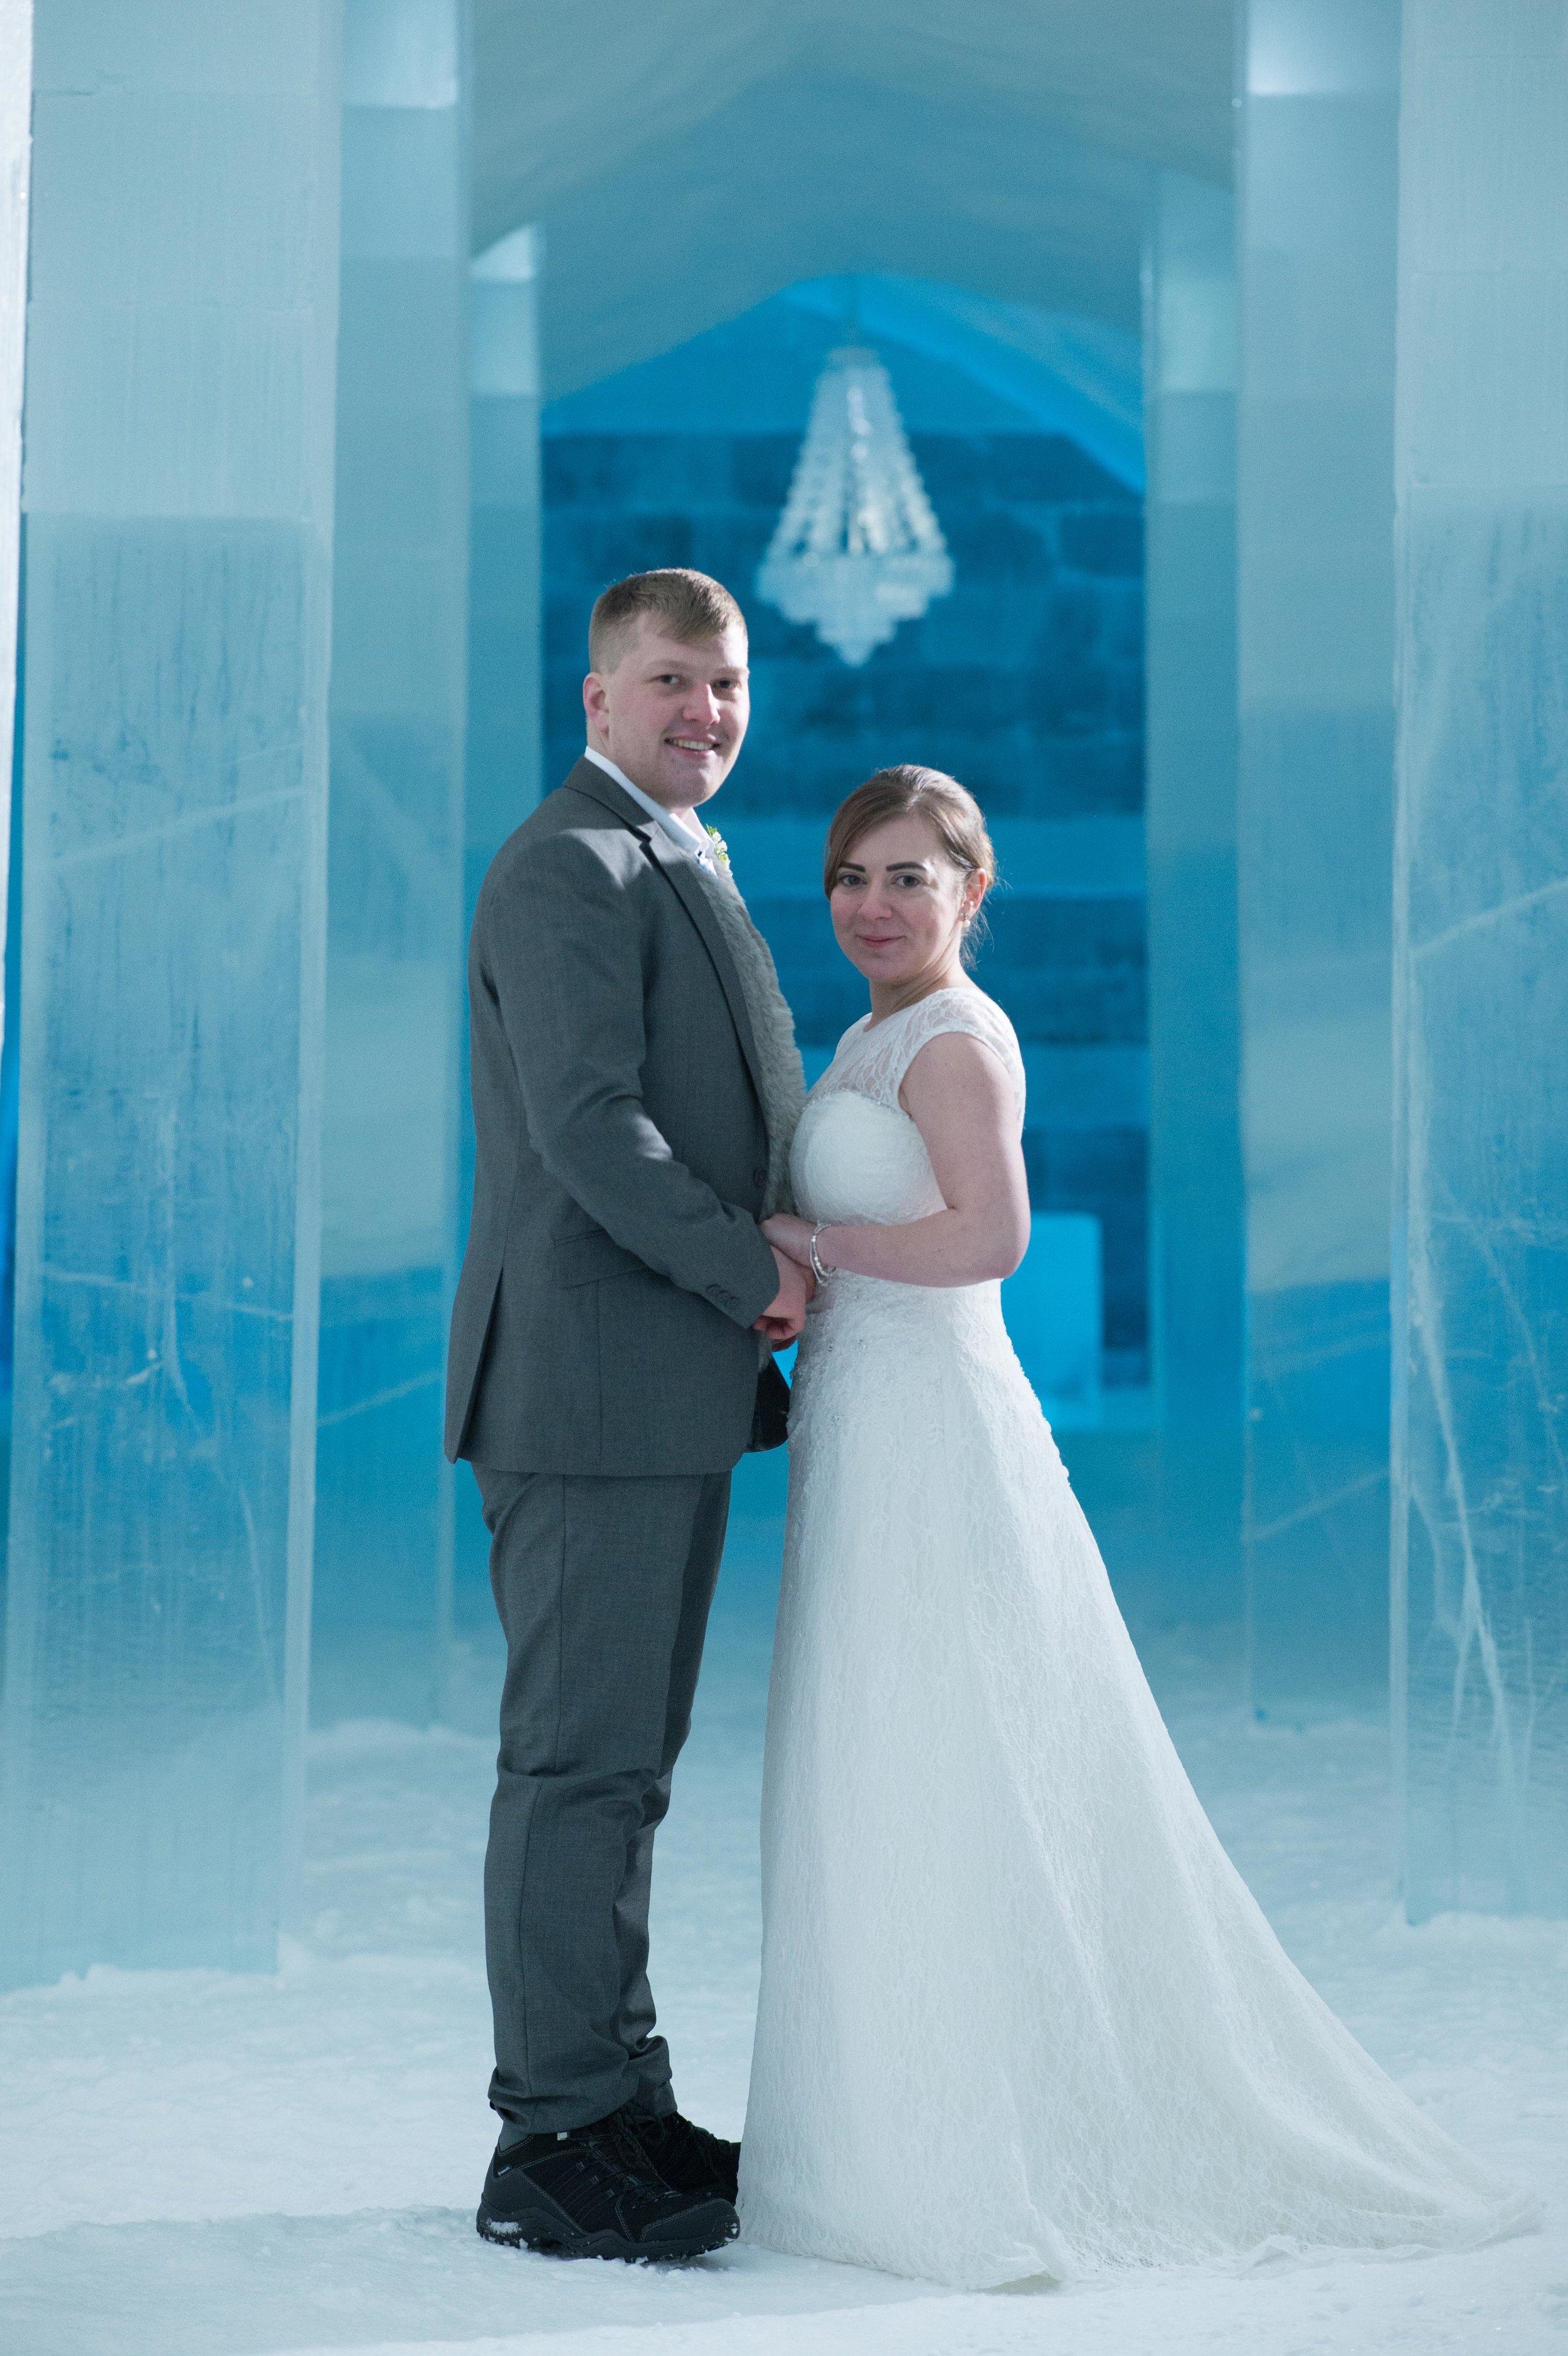 H&S - ICEHOTEL wedding - Asaf Kliger (12 of 13).jpg